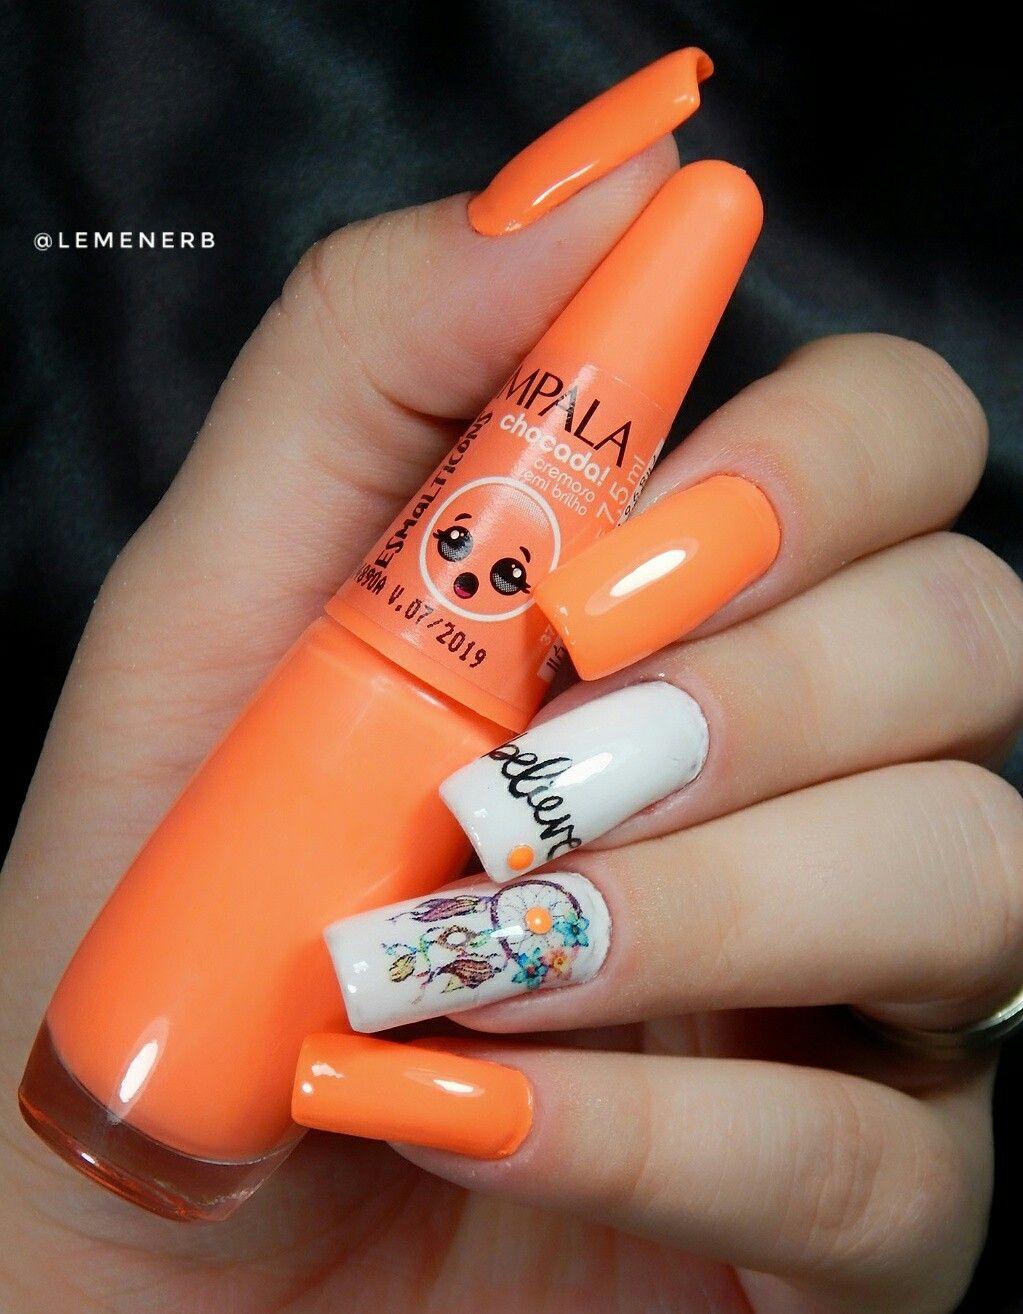 #naildesign #nailart #nails #unhadecorada #decoraçaodeunha #peliculadeunha #unhas #mani #manicure #esmalte #esmaltelaranja #esmalteimpala #esmaltechocada #summernails #filtrodossonhos #dreamcatcher